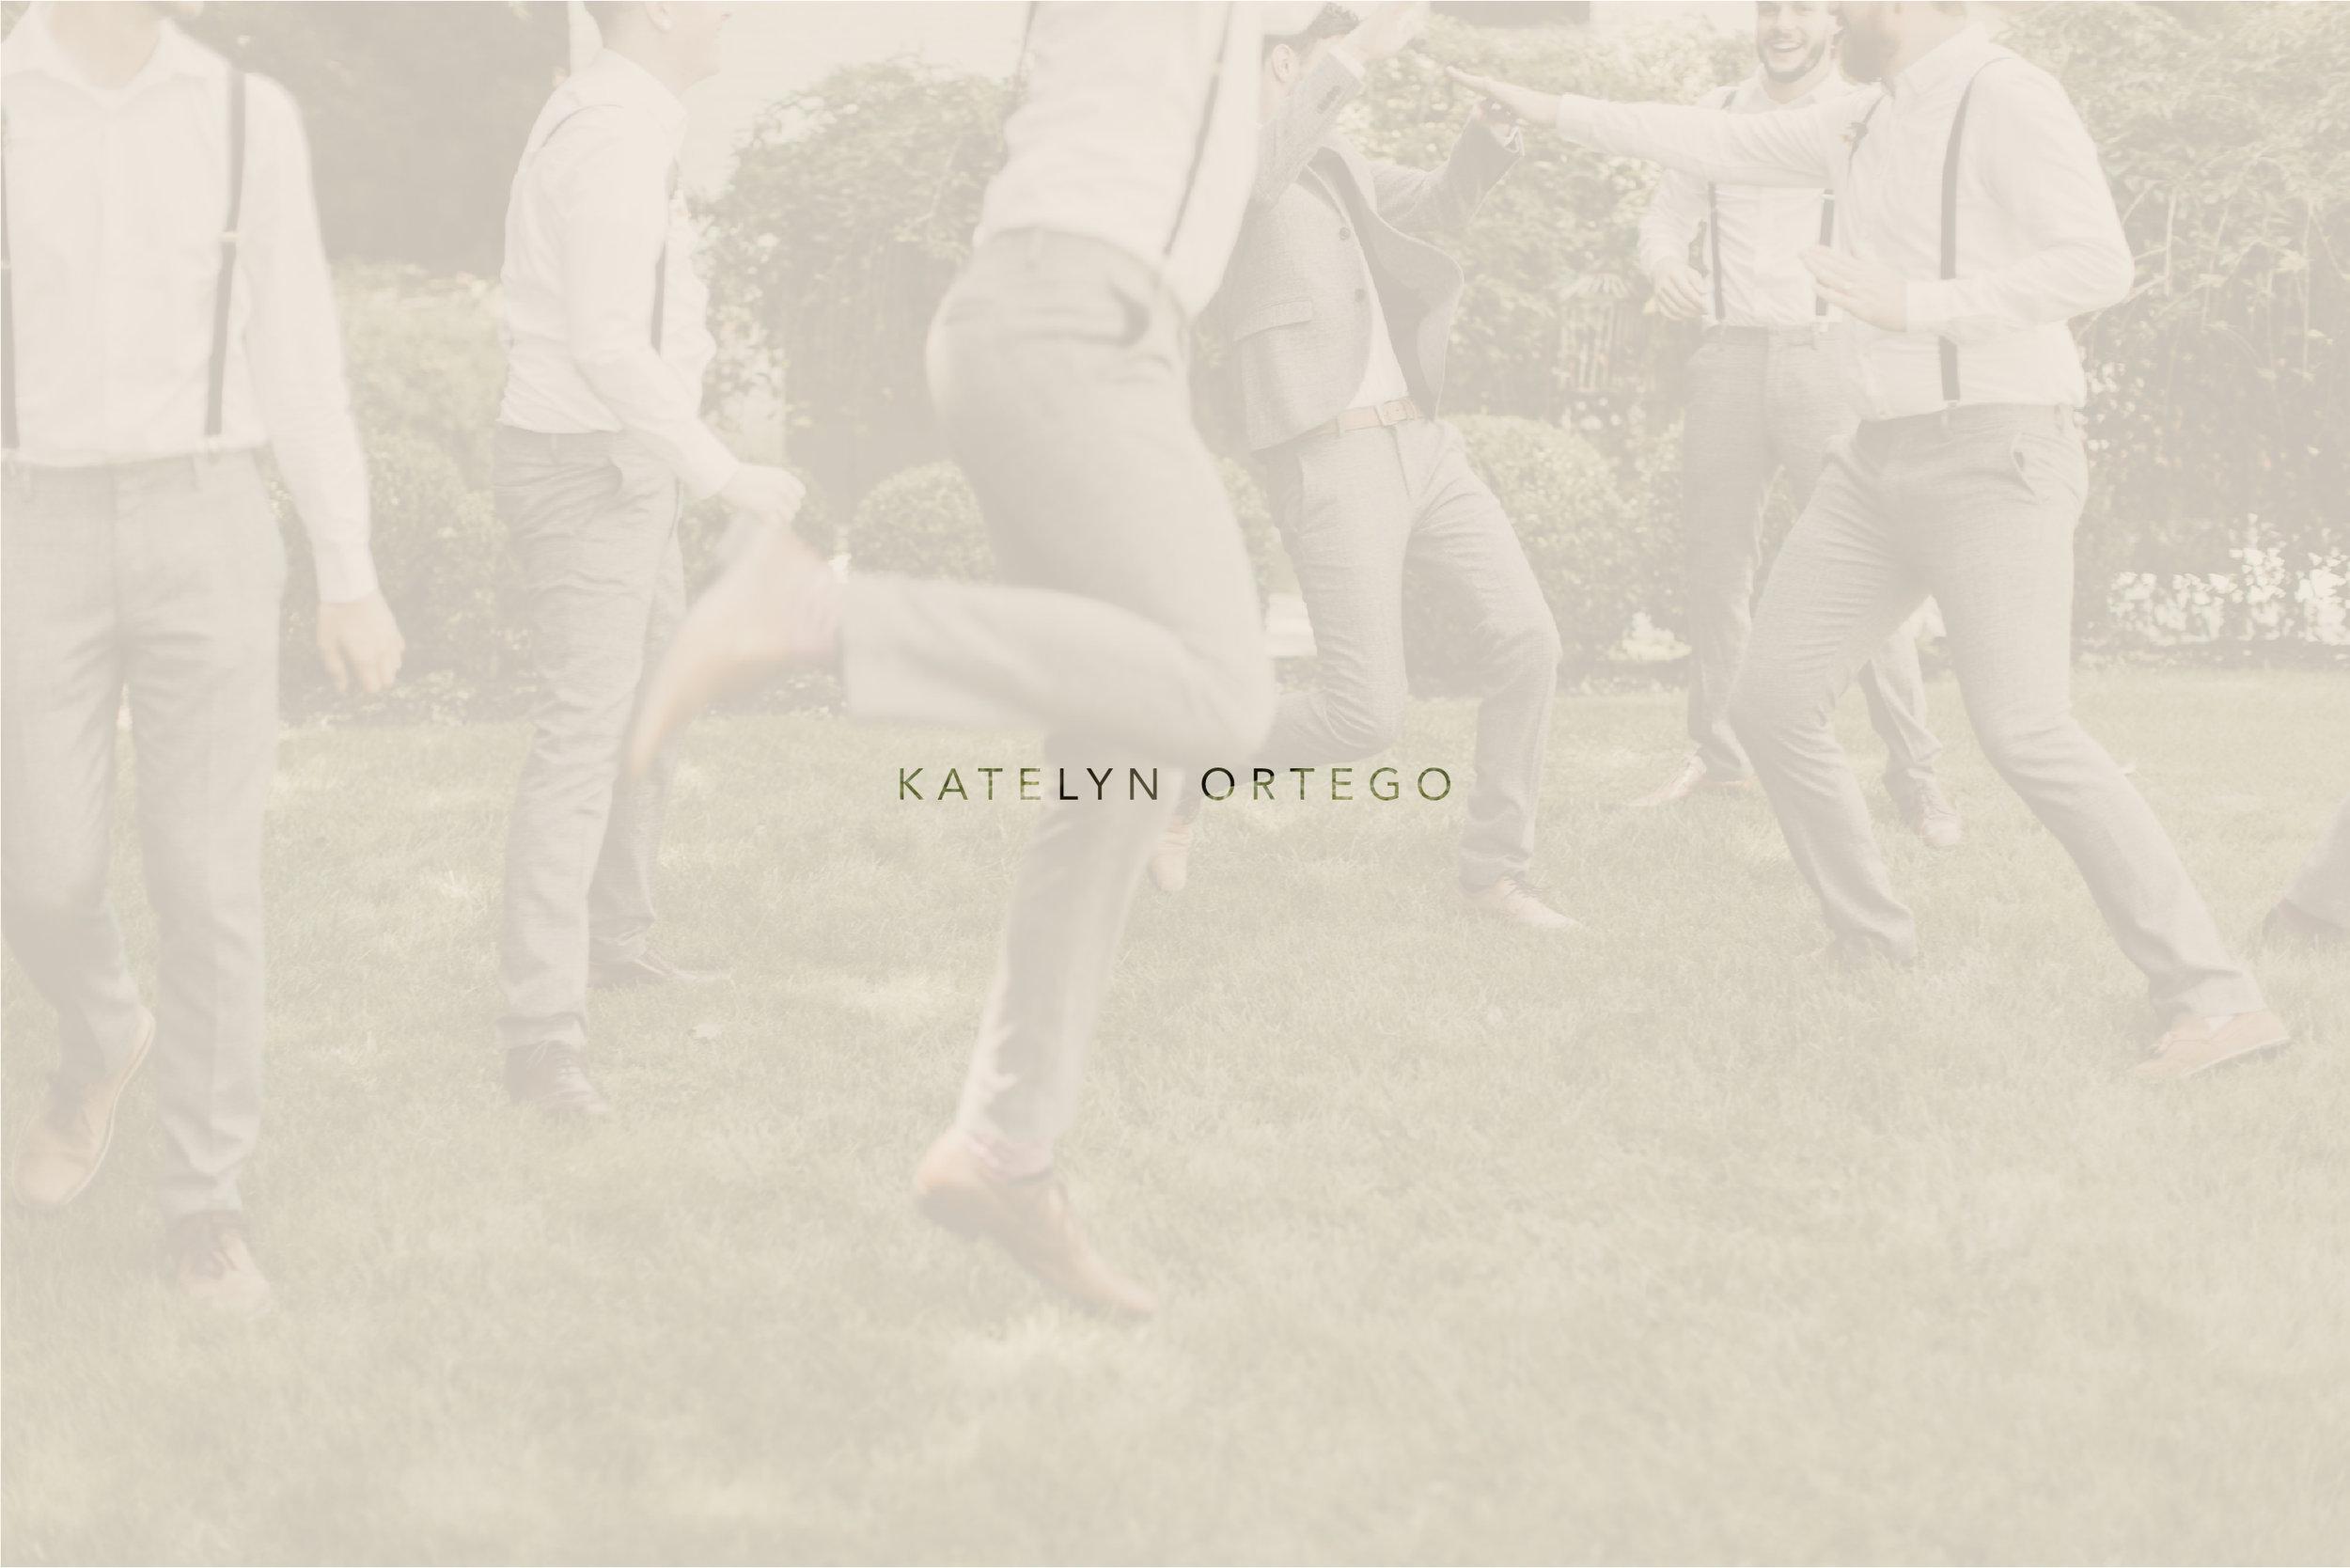 CANOPY_Katelyn Ortego_Logotype.jpg